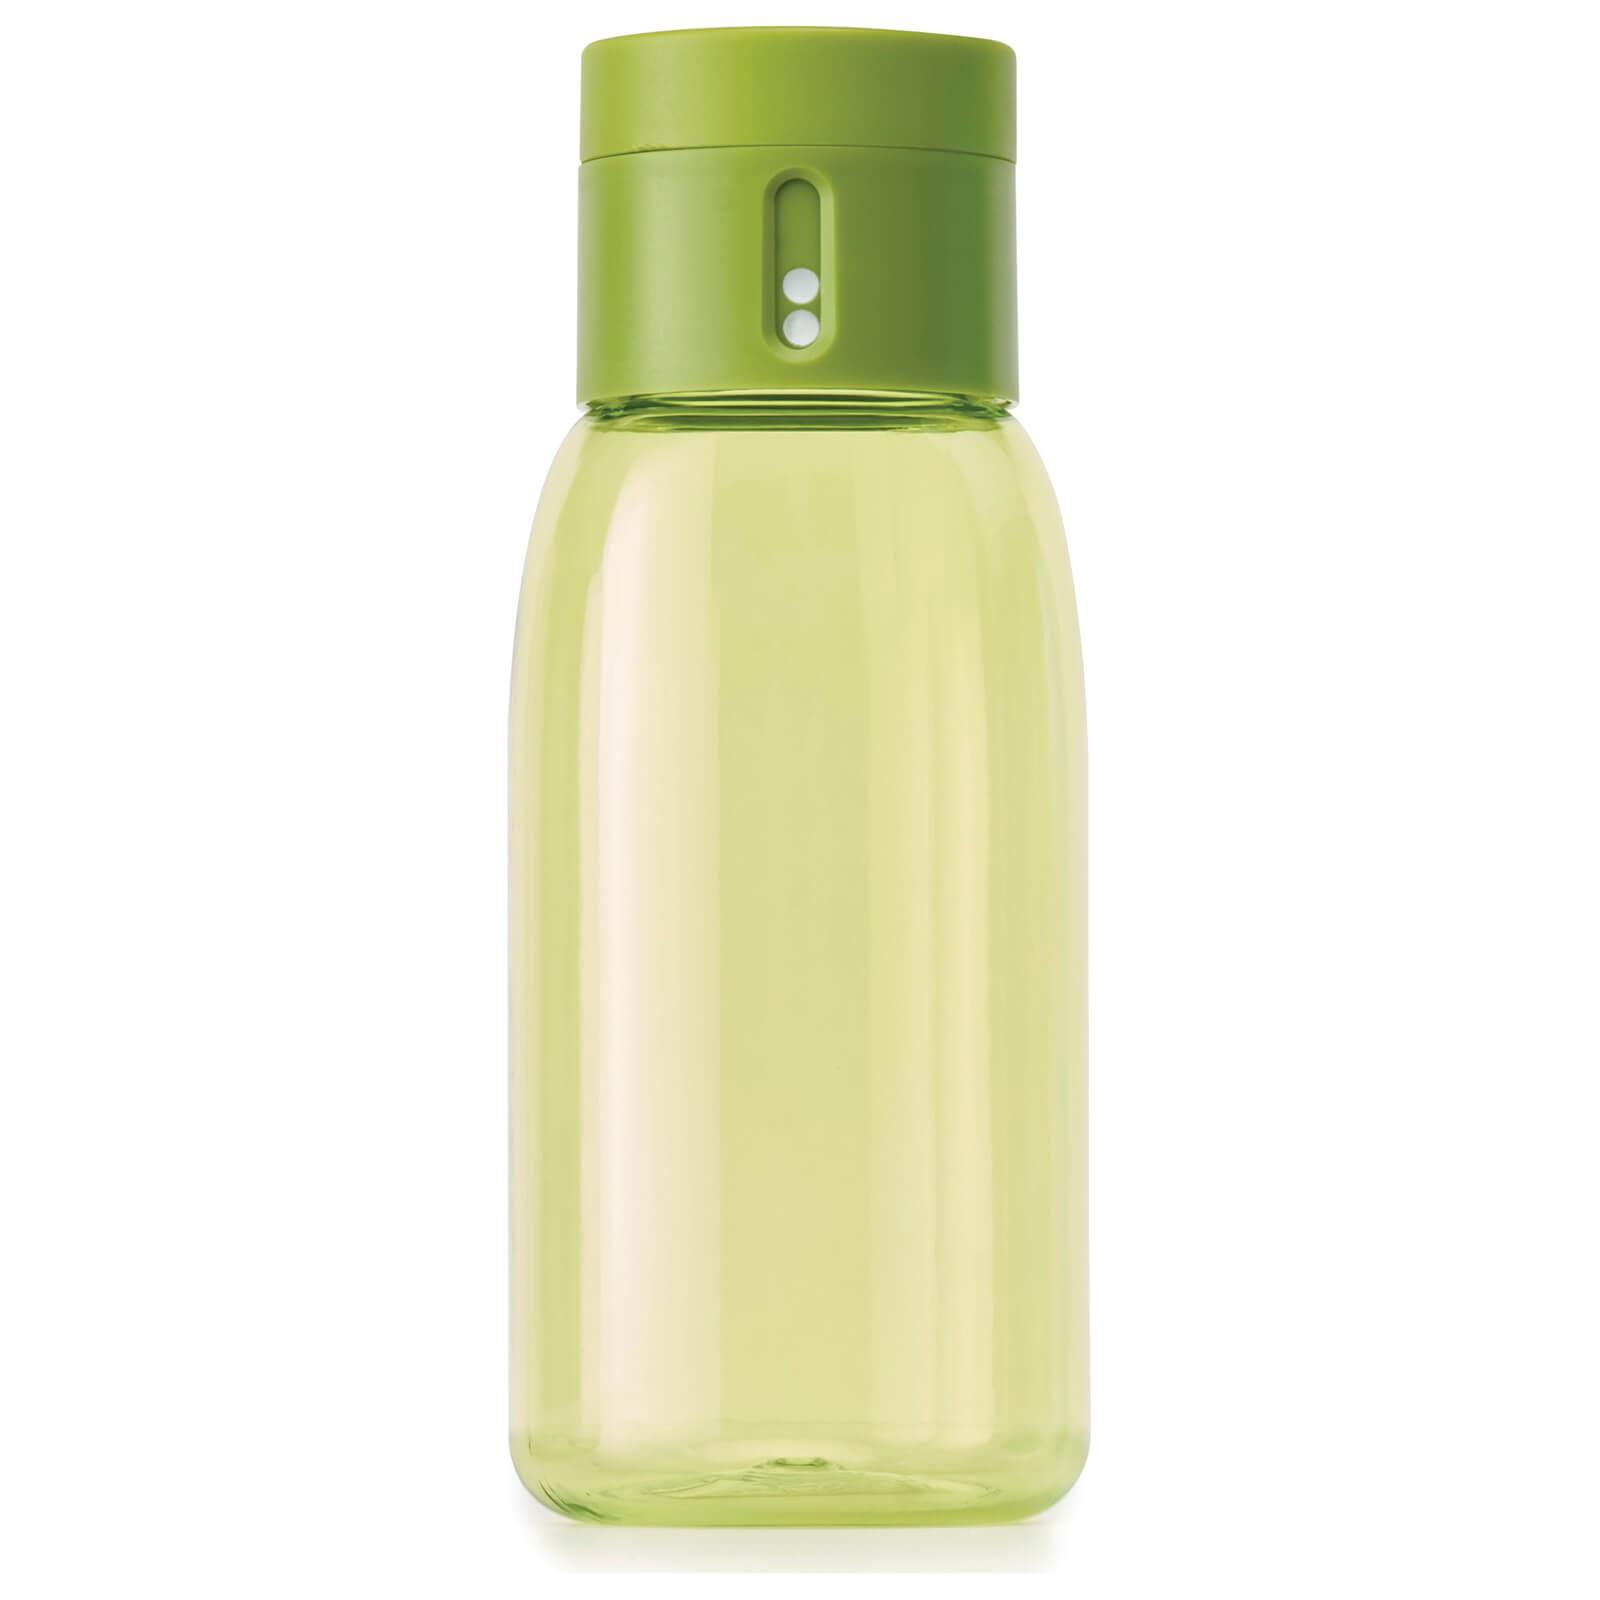 Joseph Joseph Dot Hydration-Tracking Water Bottle - Green 400ml